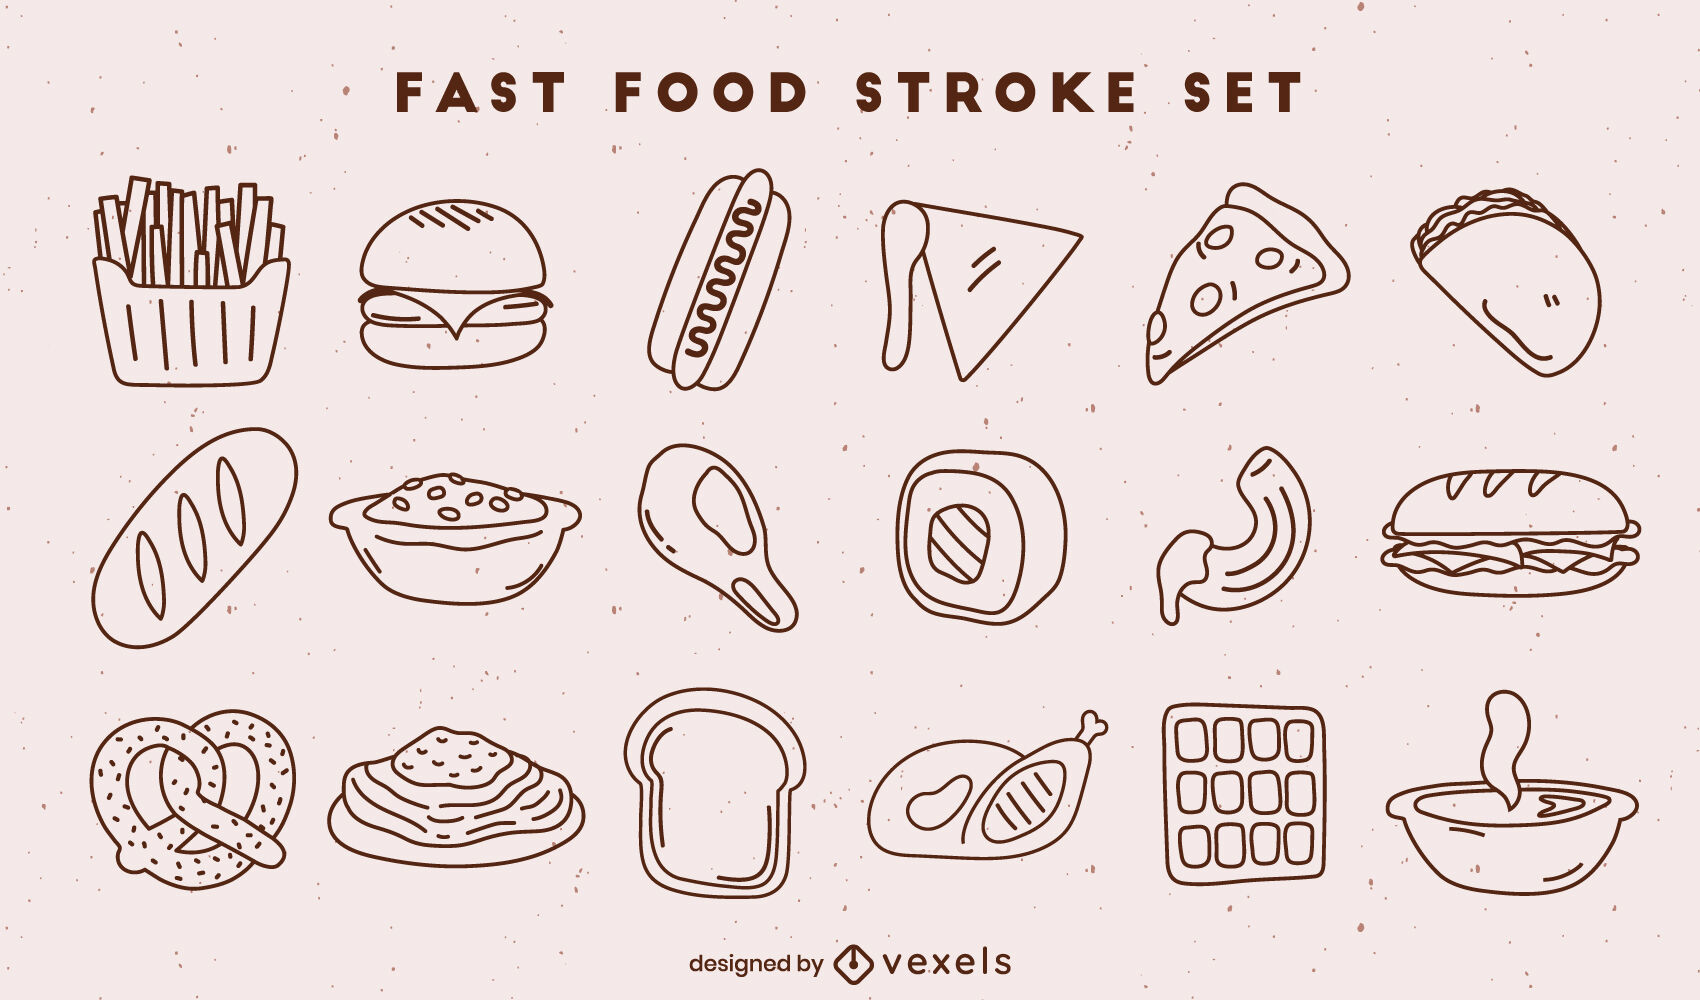 Set of fast food stroke elements